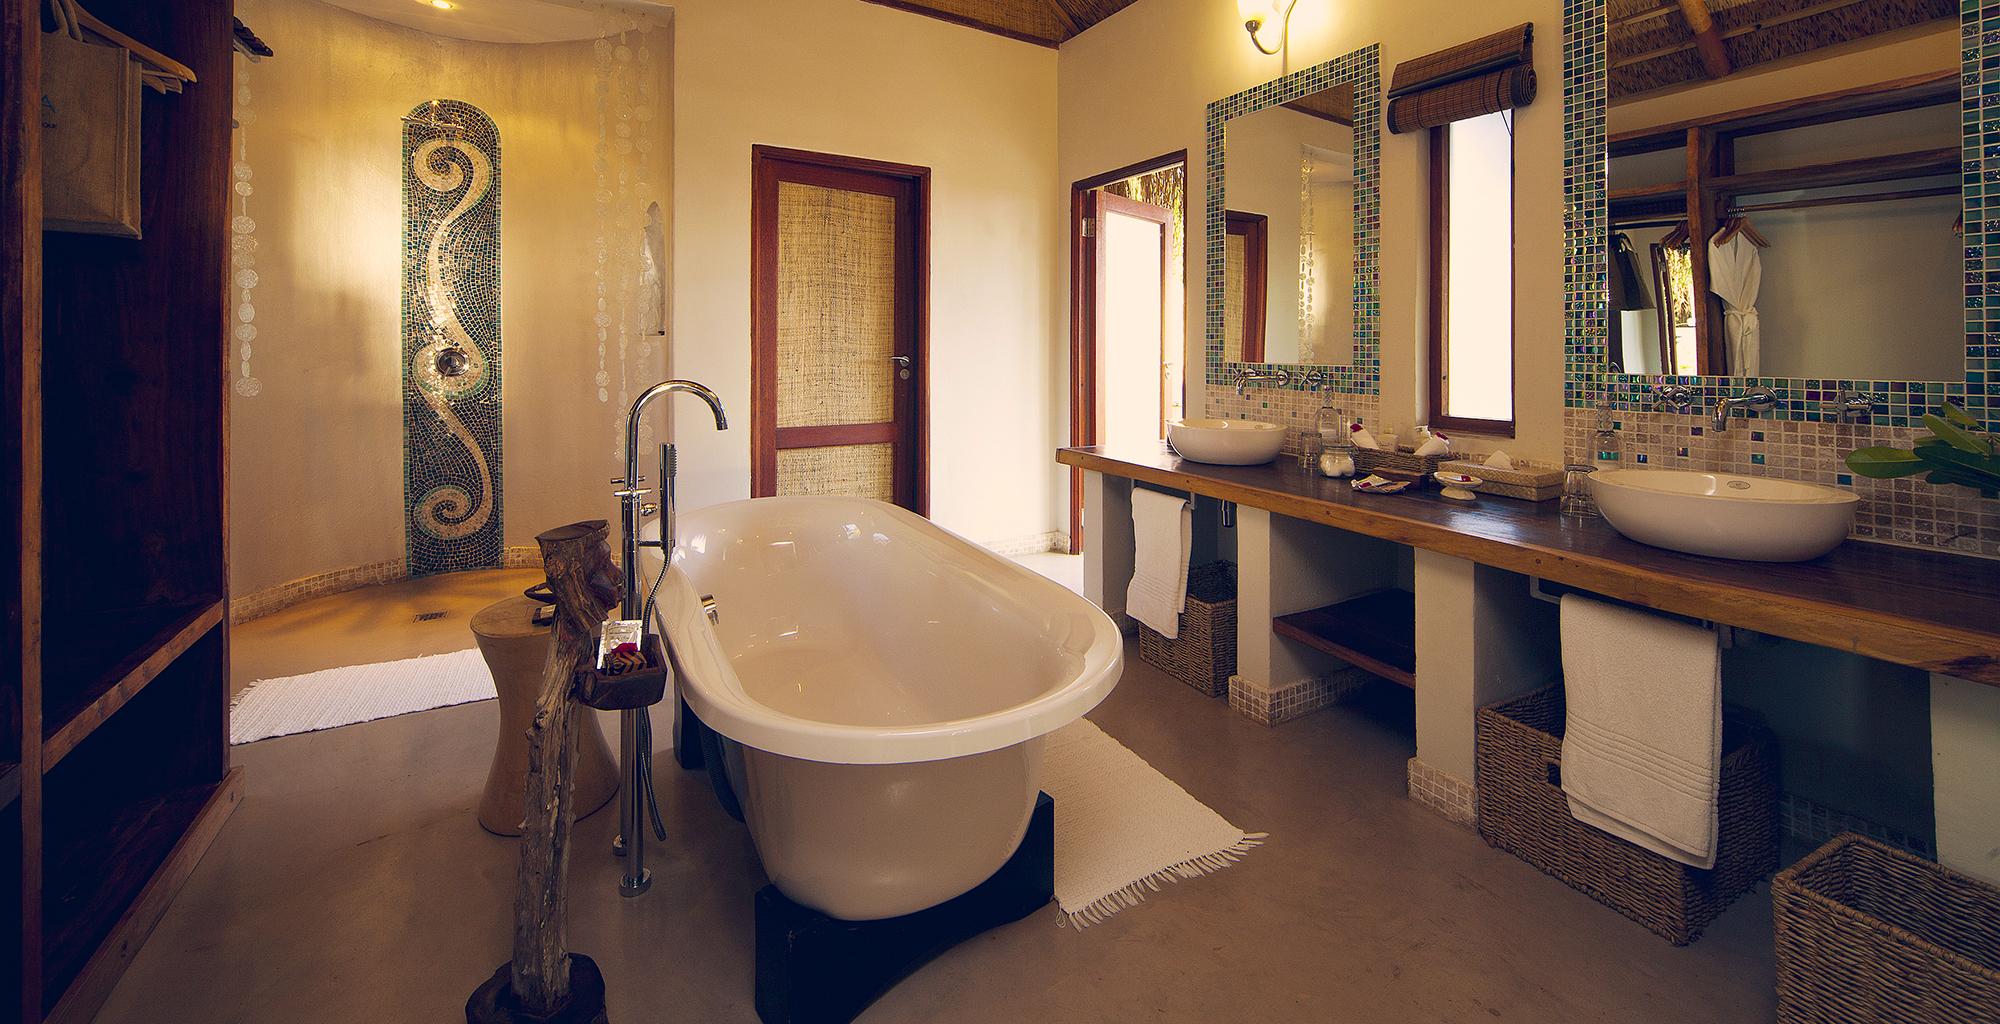 Mozambique-Bazaruto-Archipelago-Azura-Benguerra-Bathroom